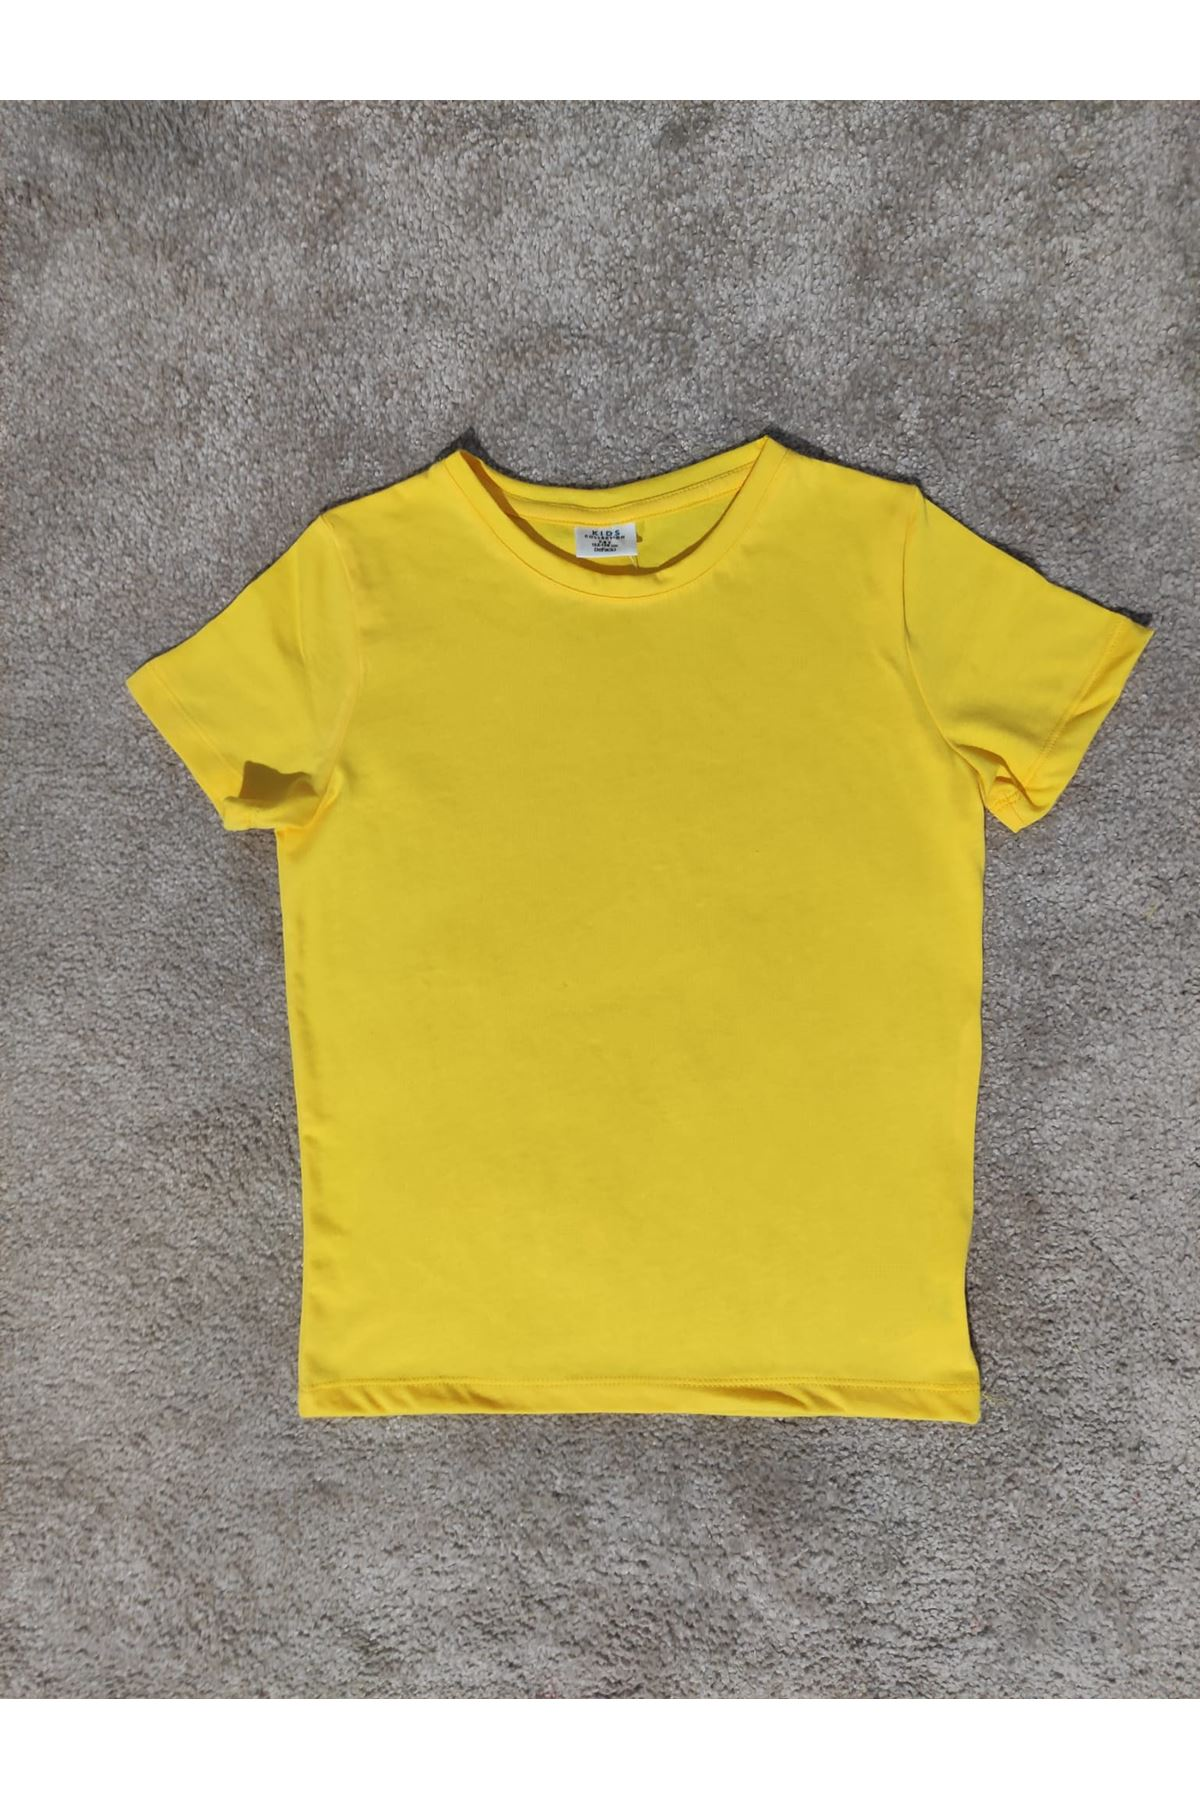 Kız Çocuk Bisiklet Yaka Sarı T-shirt